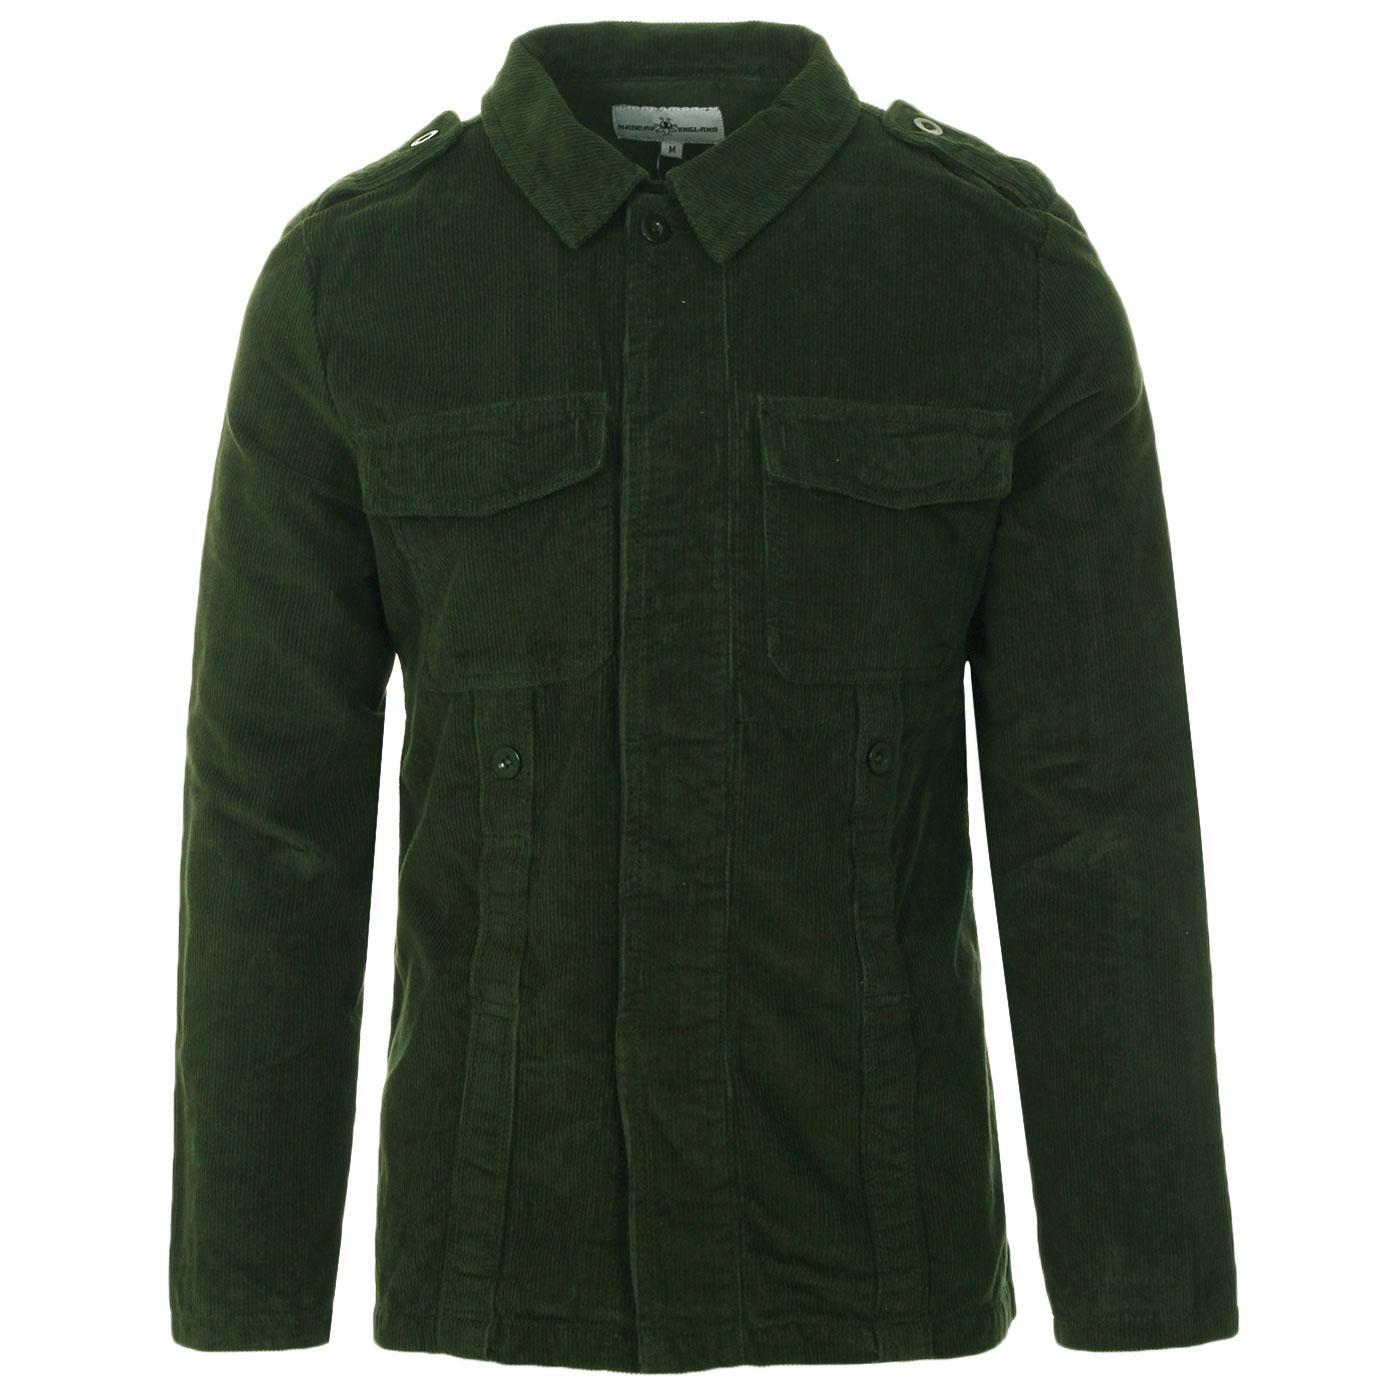 Lennon MADCAP ENGLAND Mod Cord Shirt Jacket (DF)